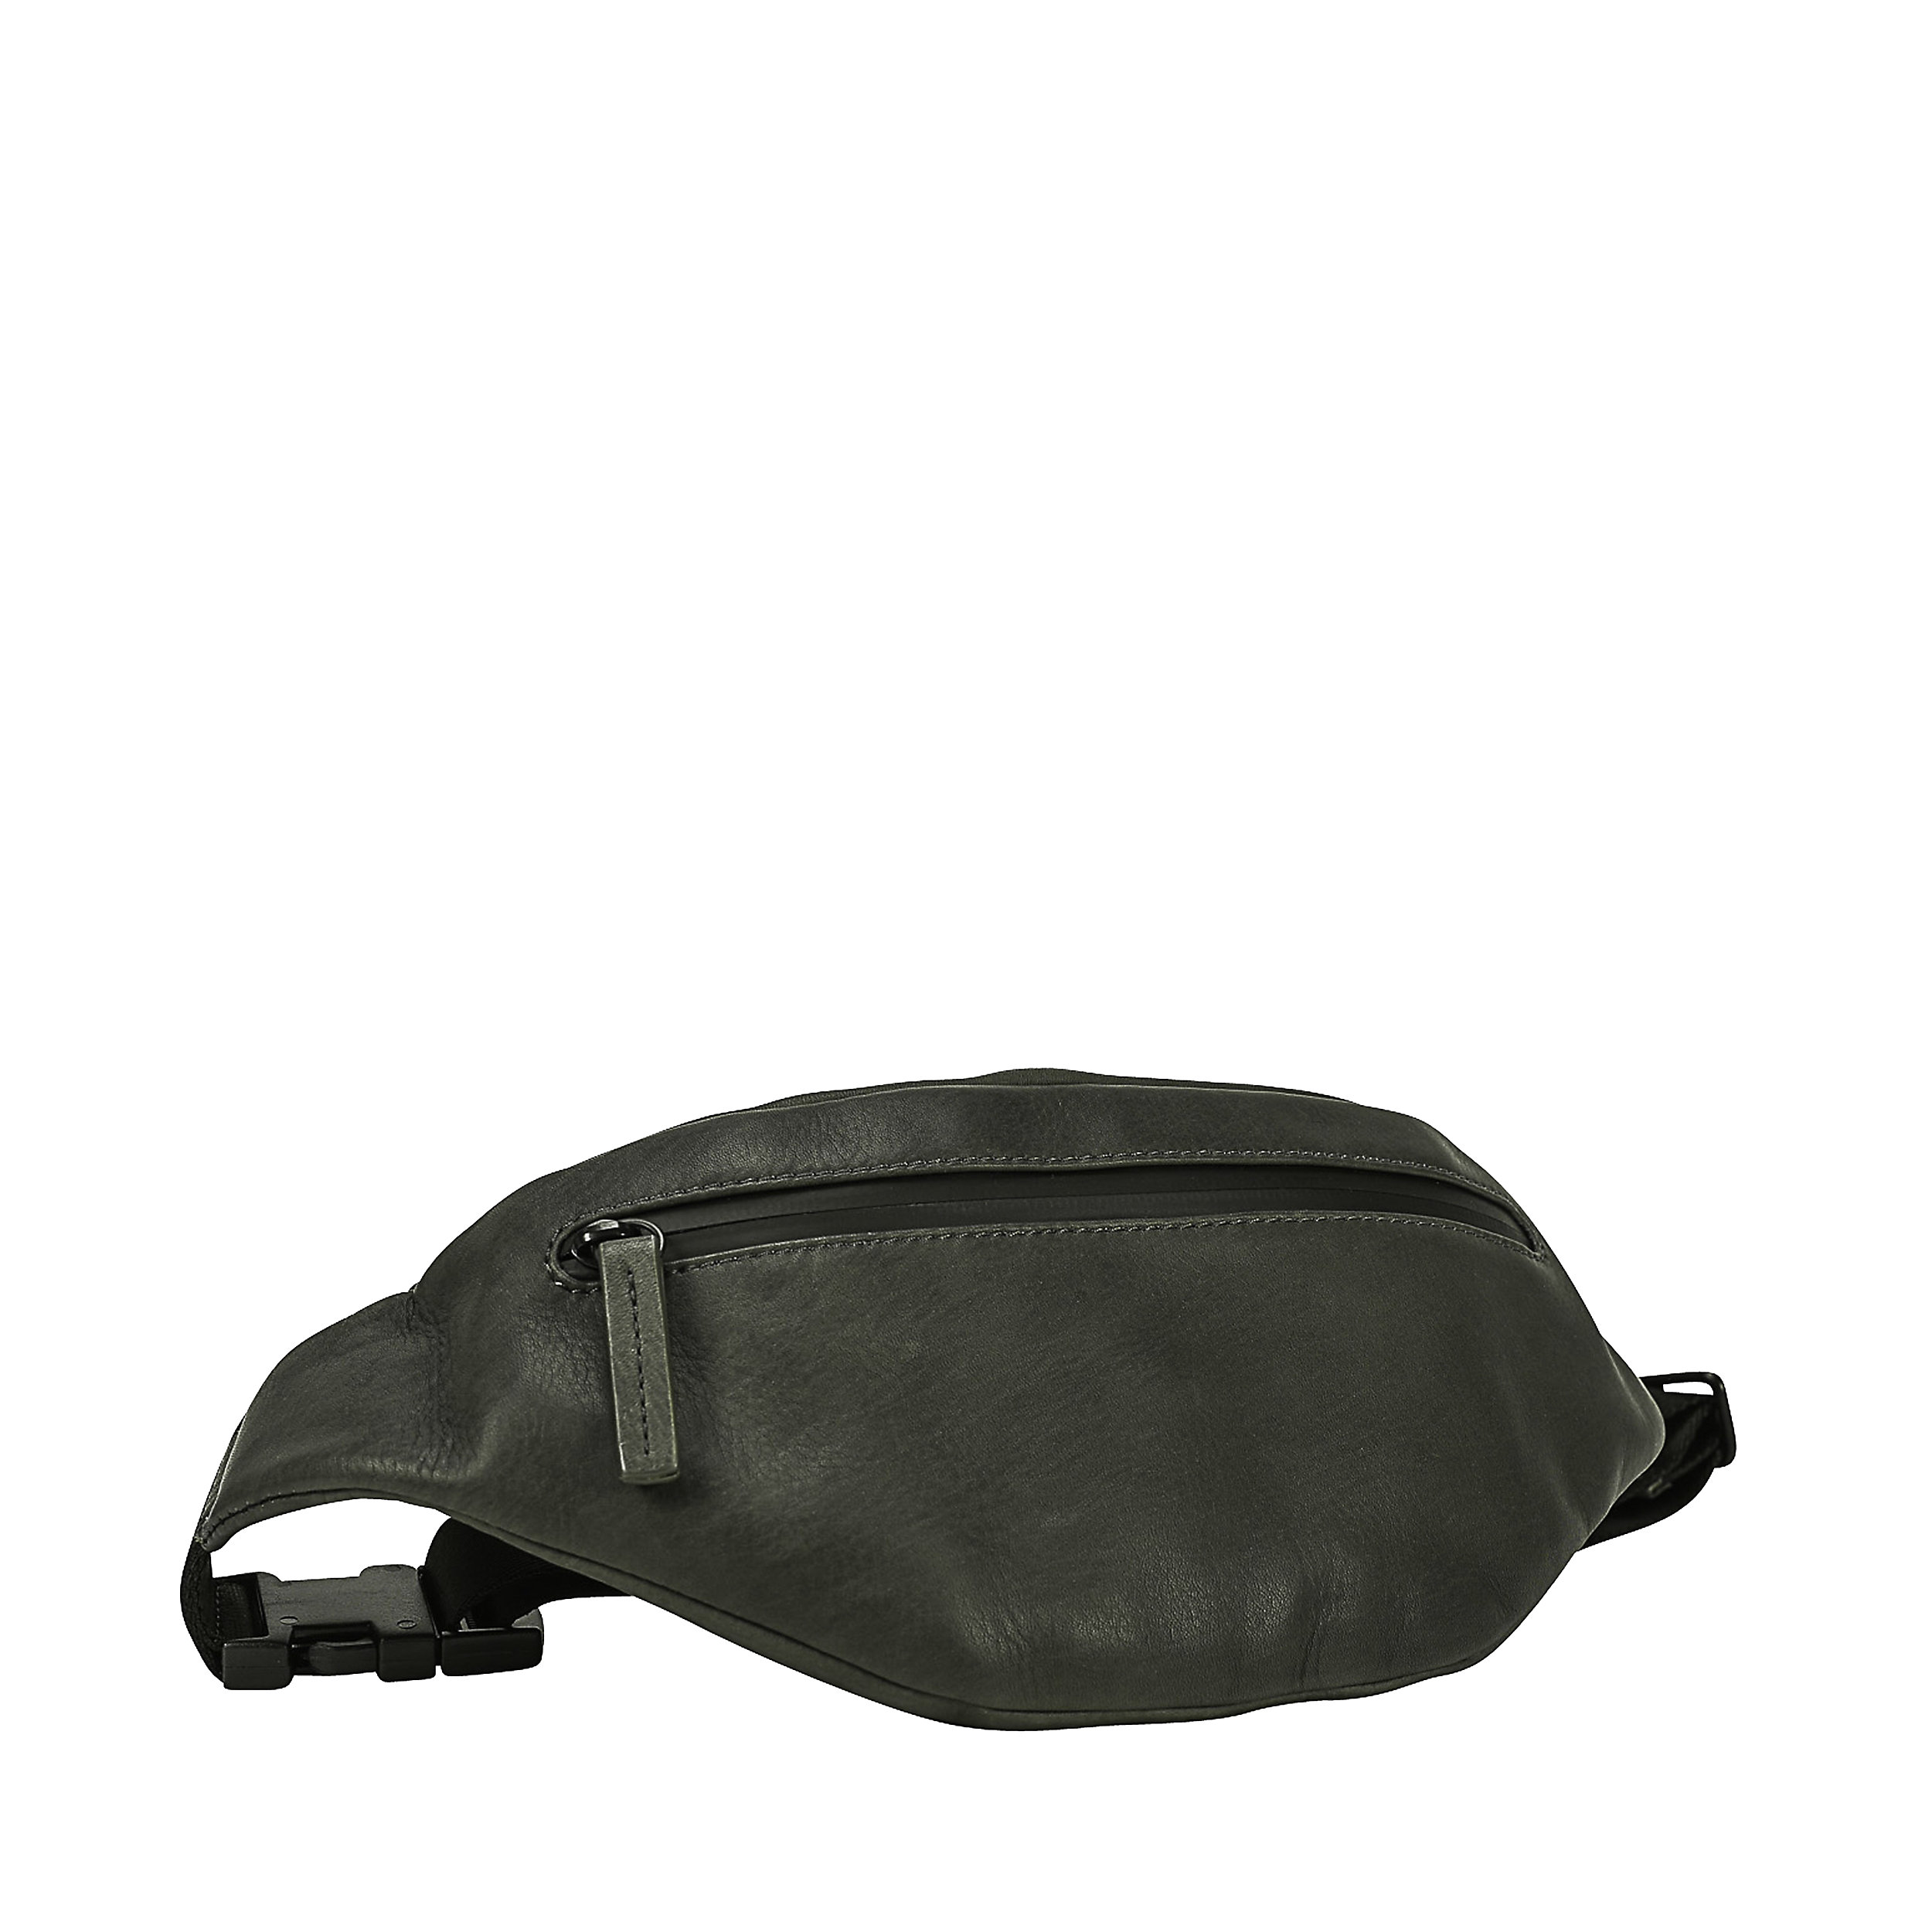 Hip Bag Den Haag